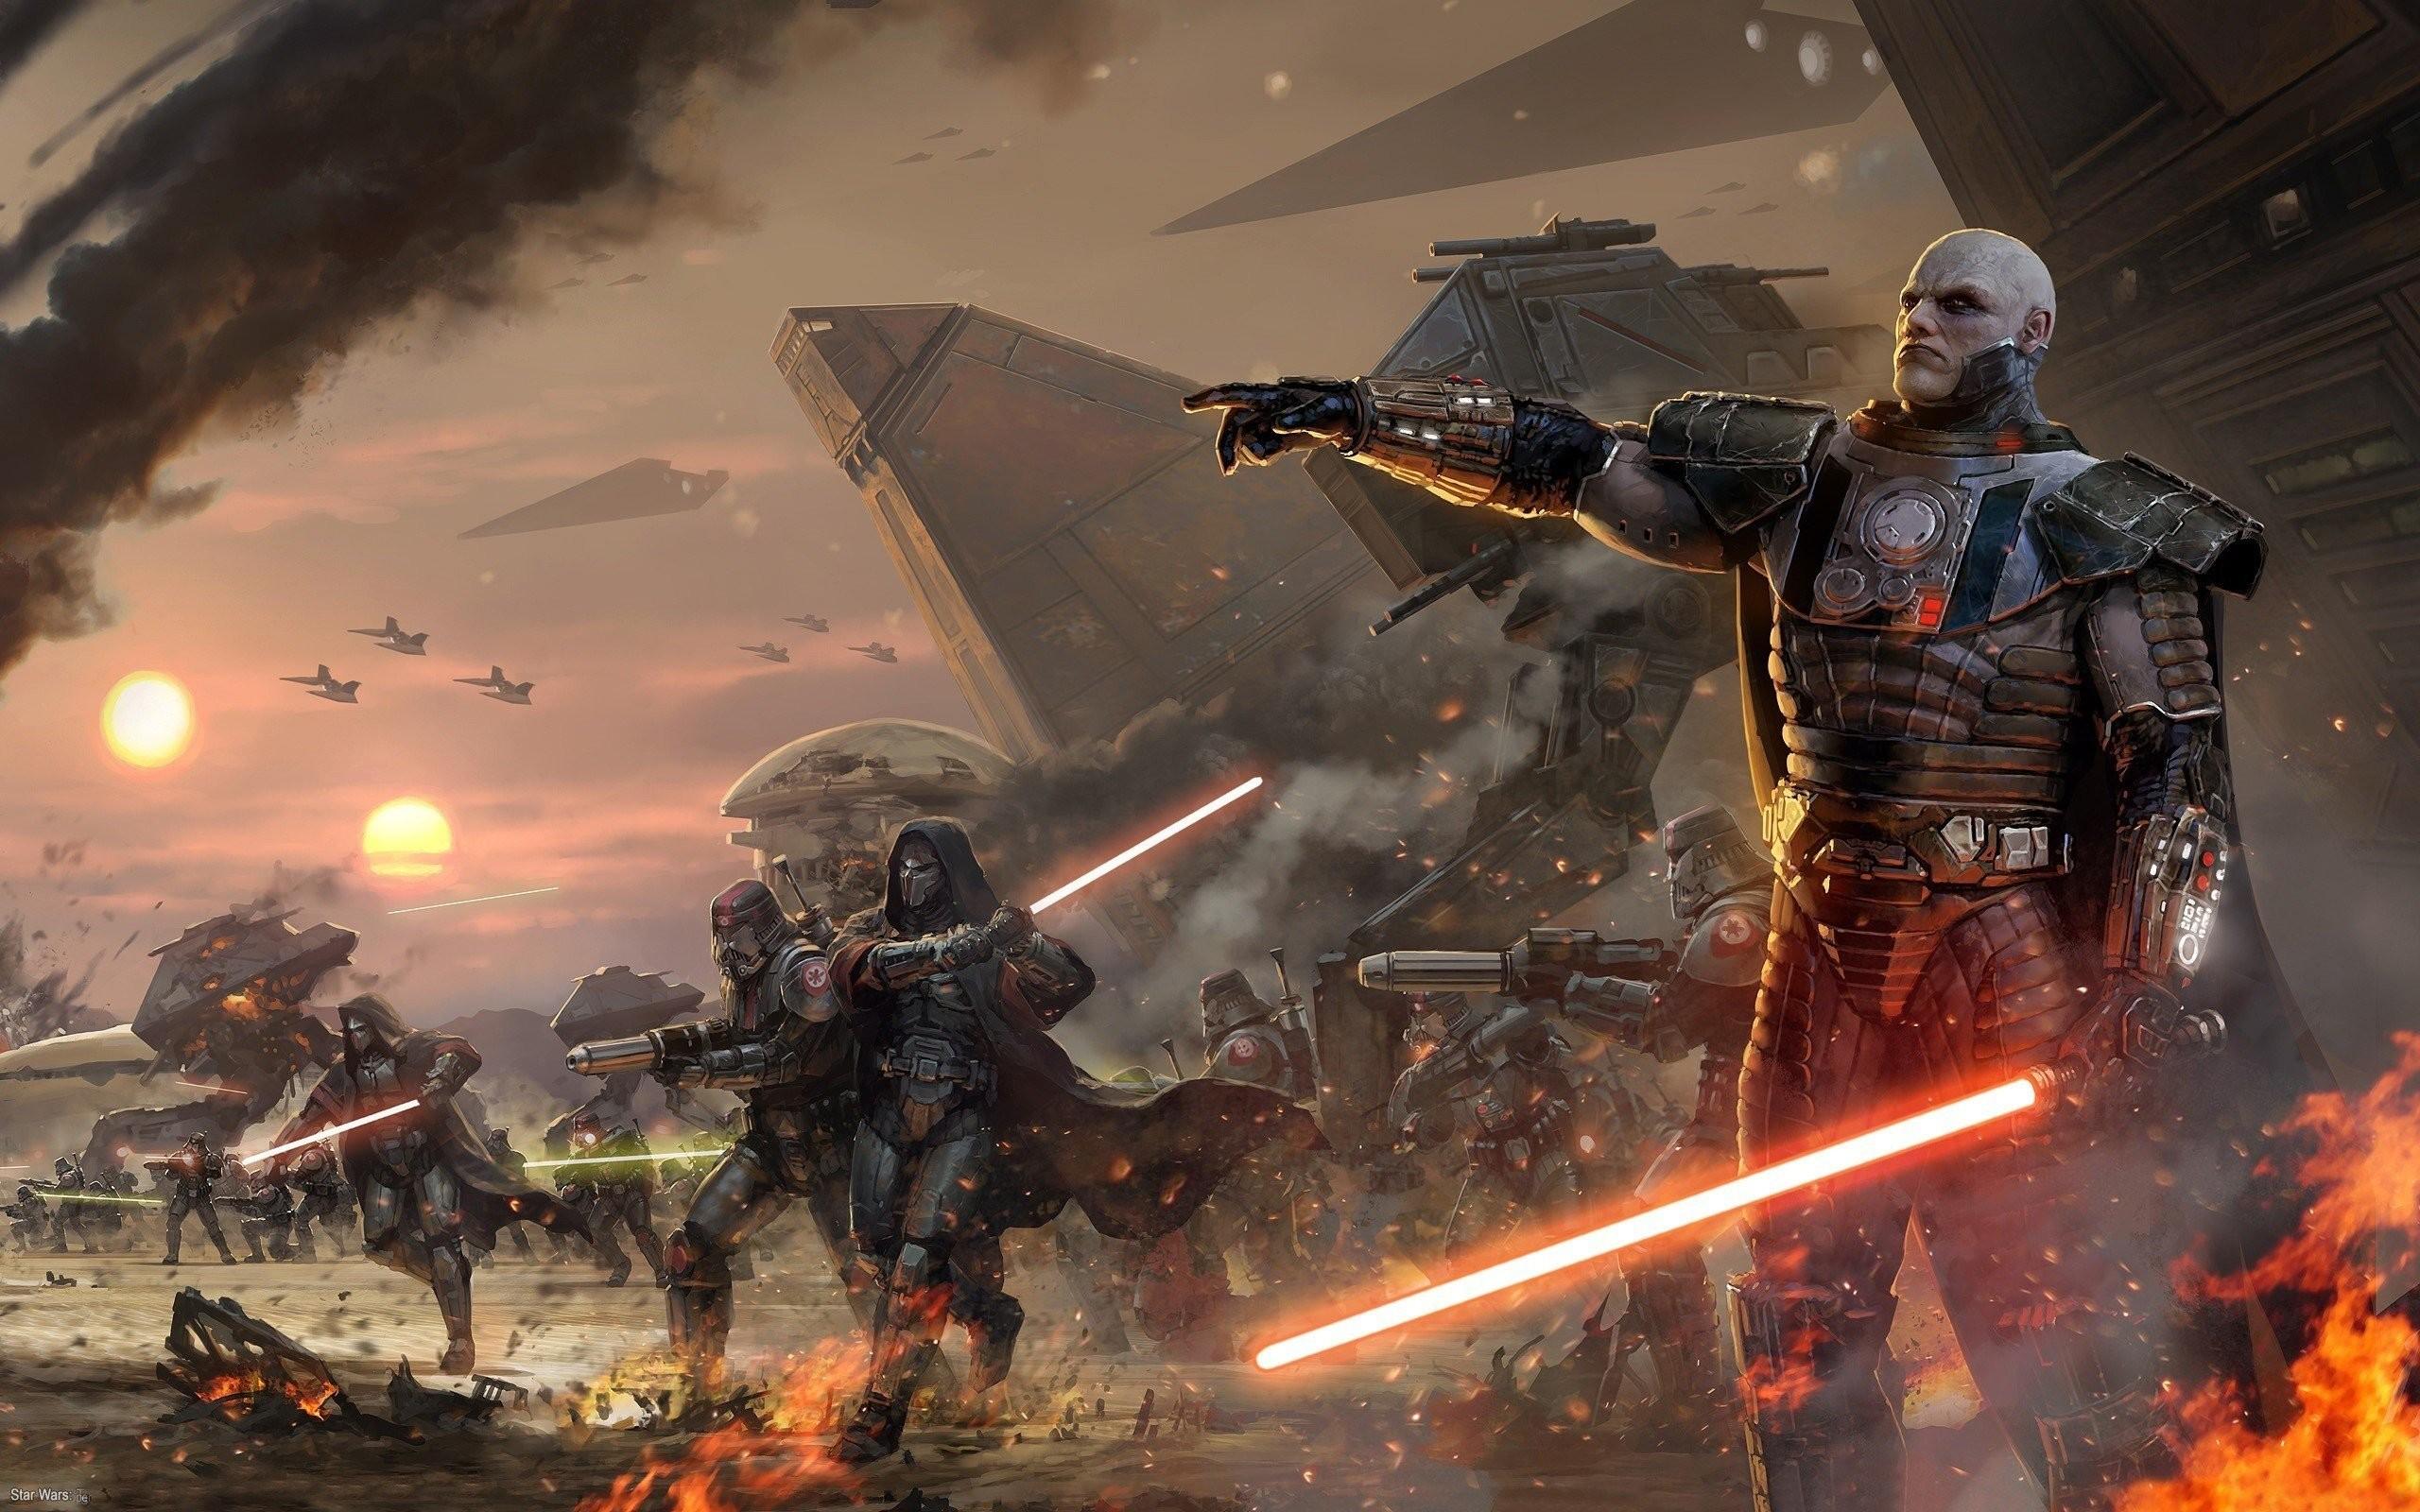 Star Wars lightsabers Sith artwork Star Wars: The Old Republic Coruscant  Darth Malgus wallpaper     275600   WallpaperUP